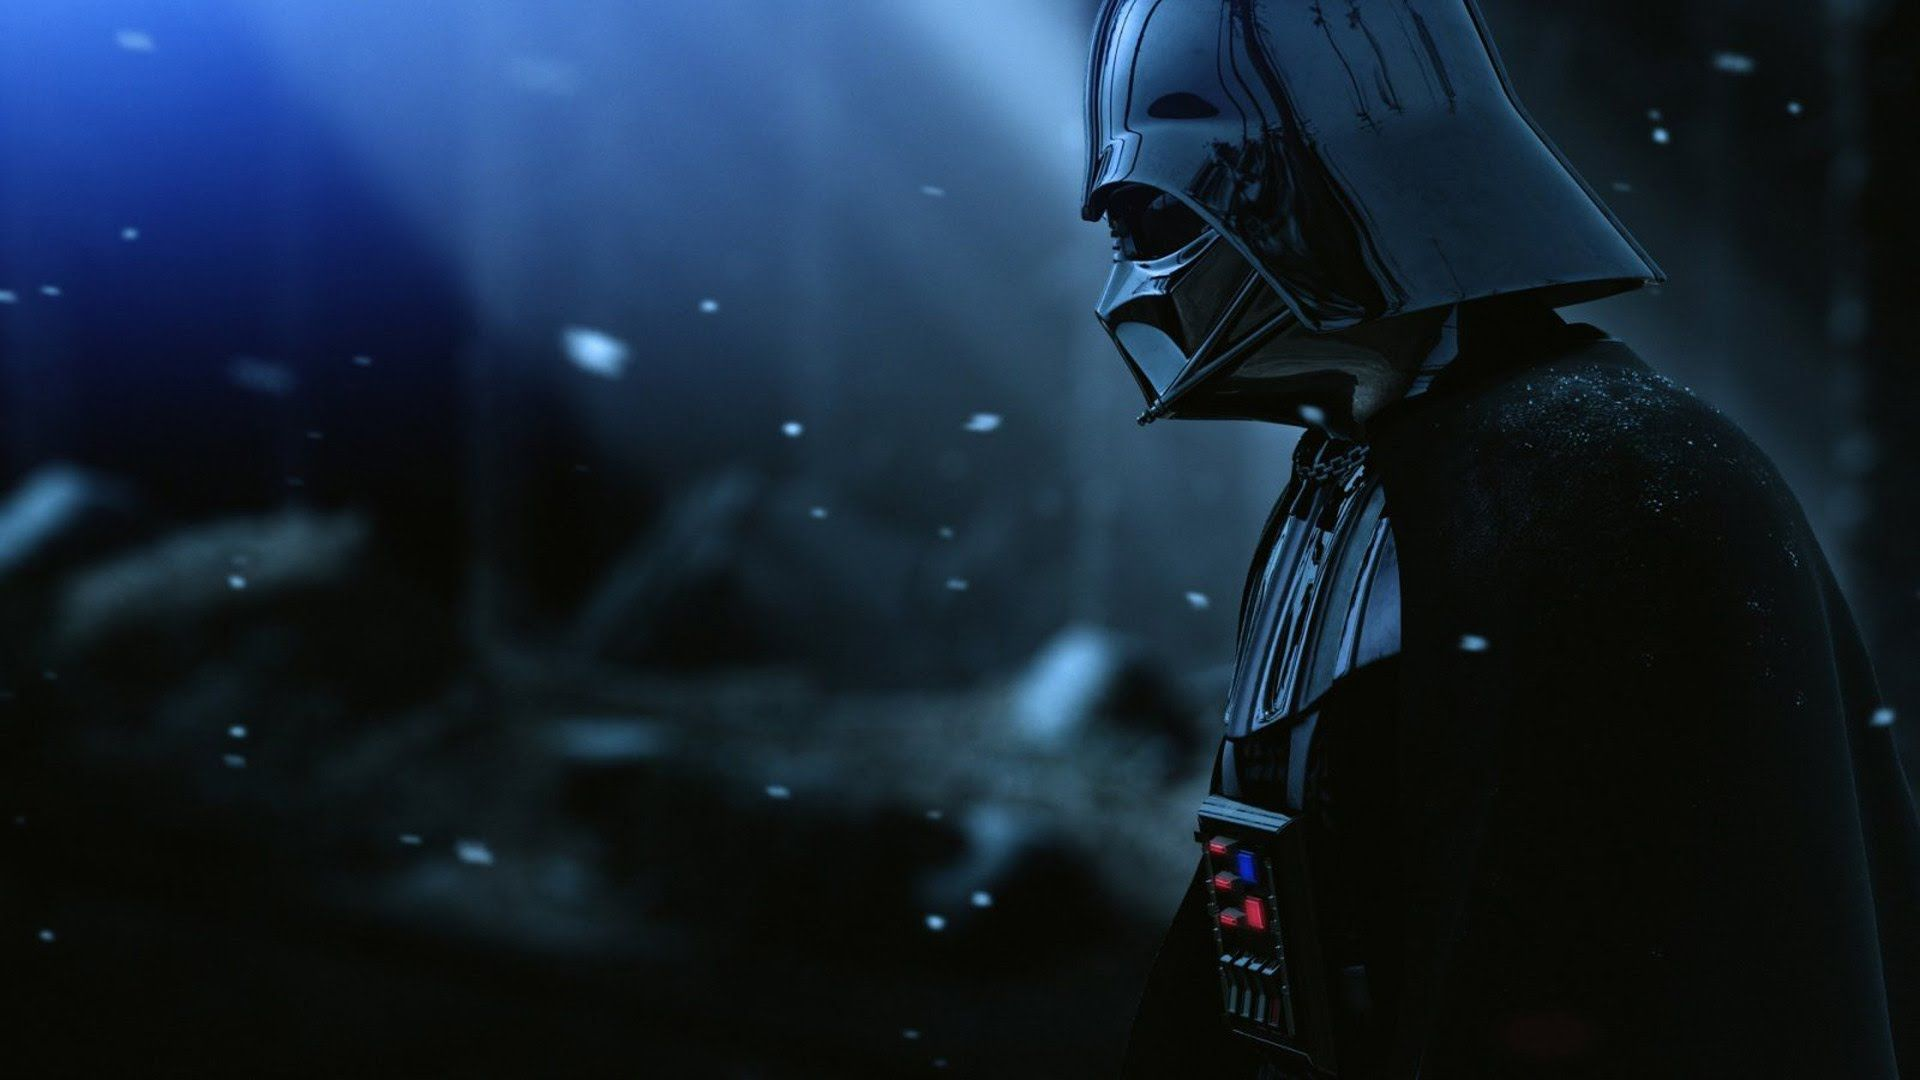 The Philosophy Of Anakin Skywalker Explored In Cool Star Wars Video Darth Vader Wallpaper Star Wars Background Star Wars Wallpaper